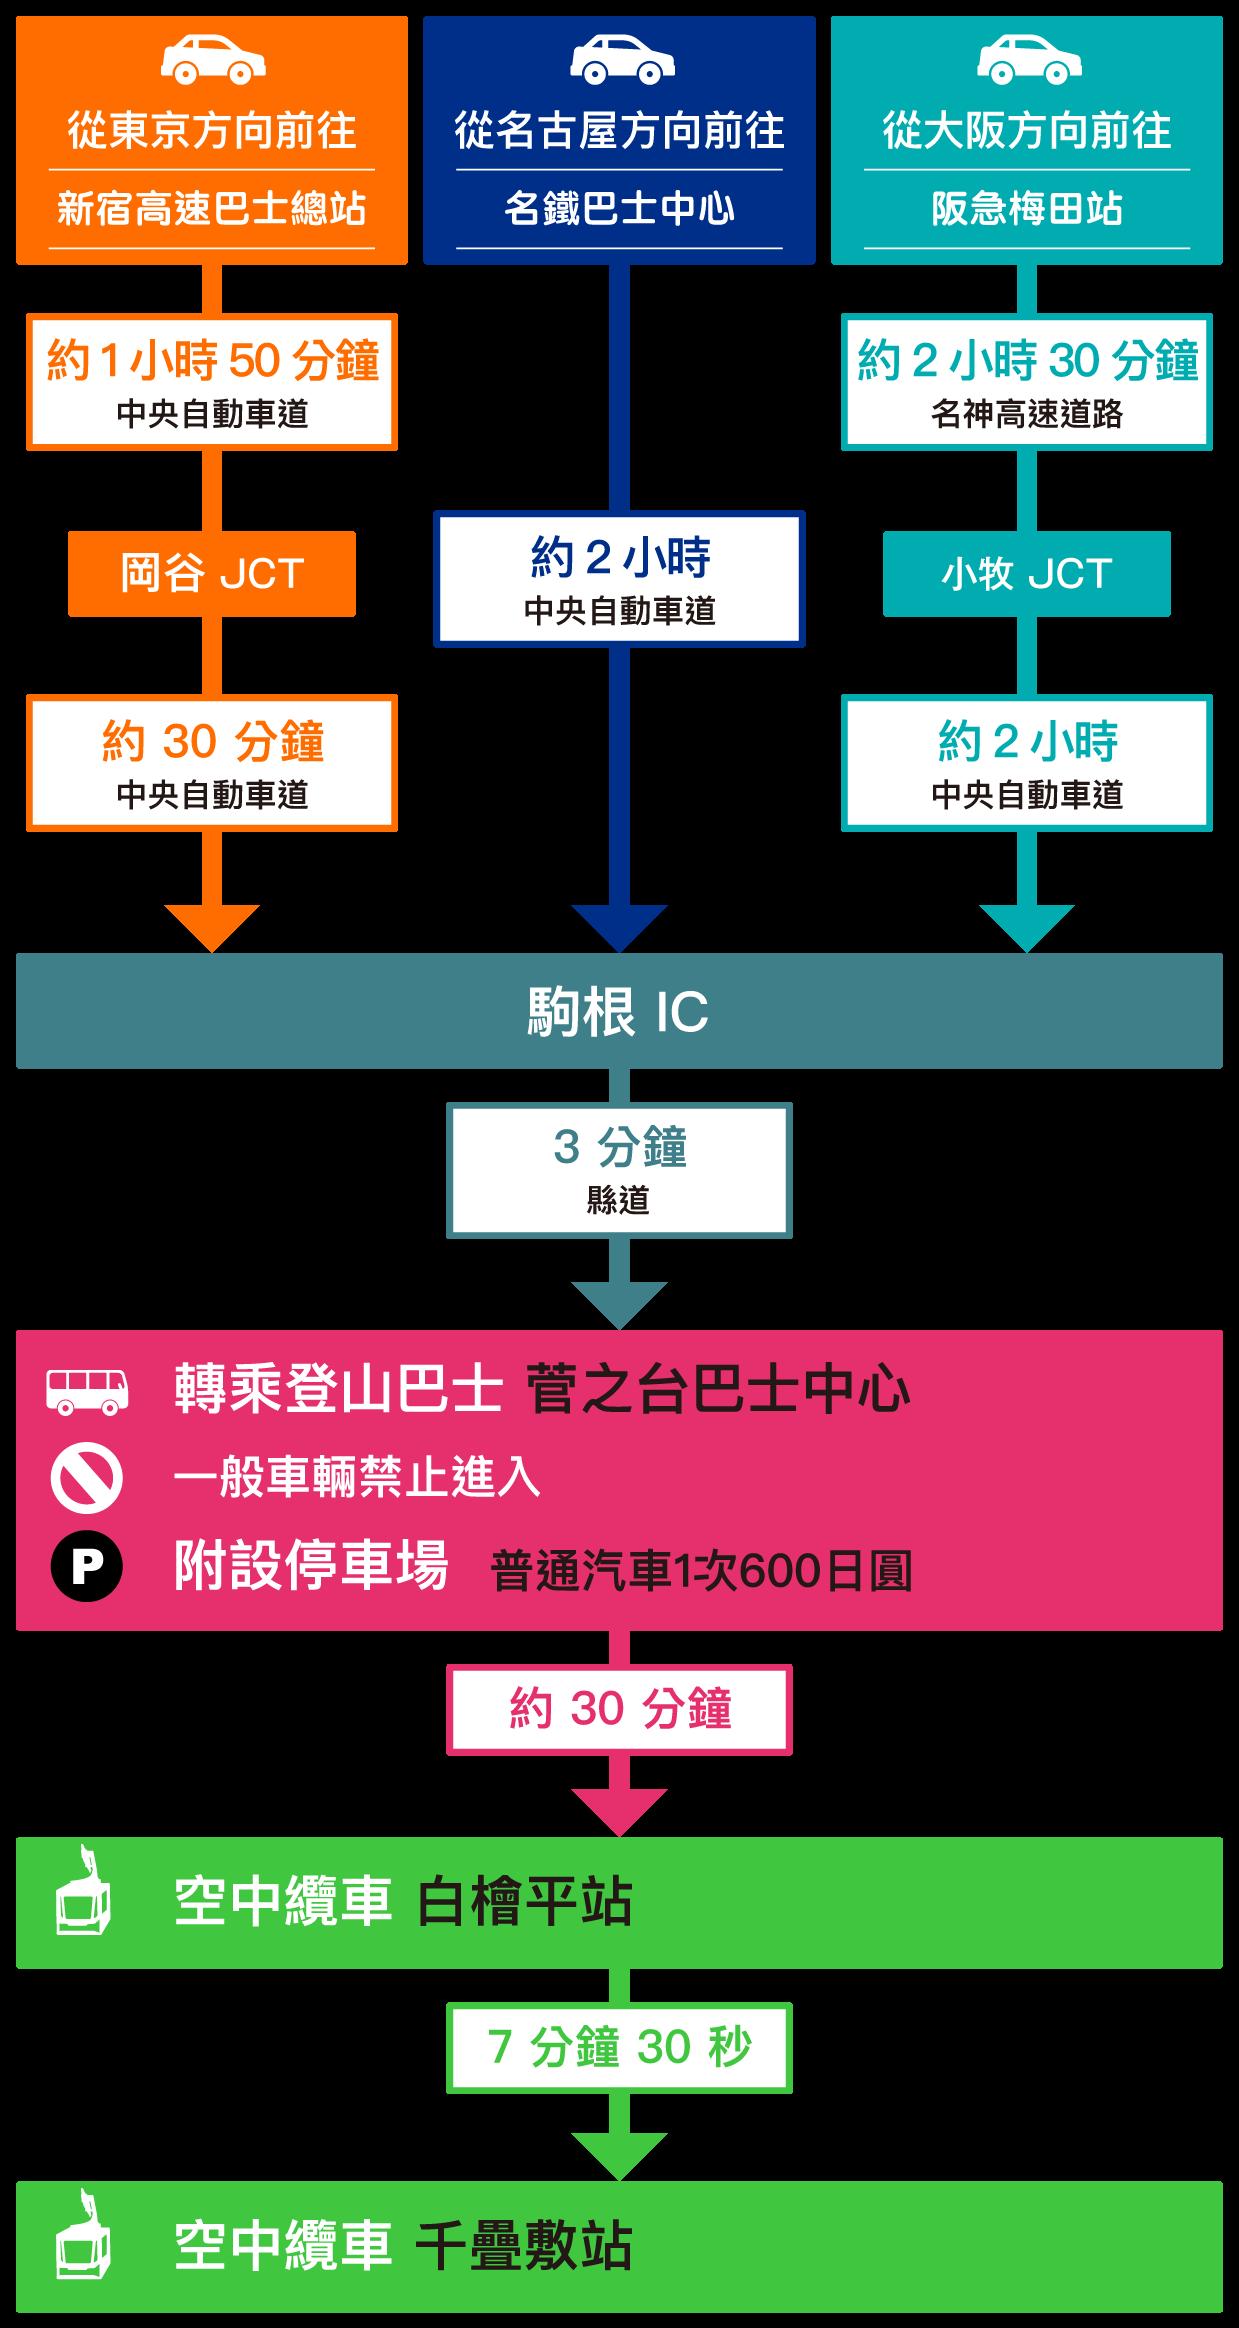 access-car-1-1